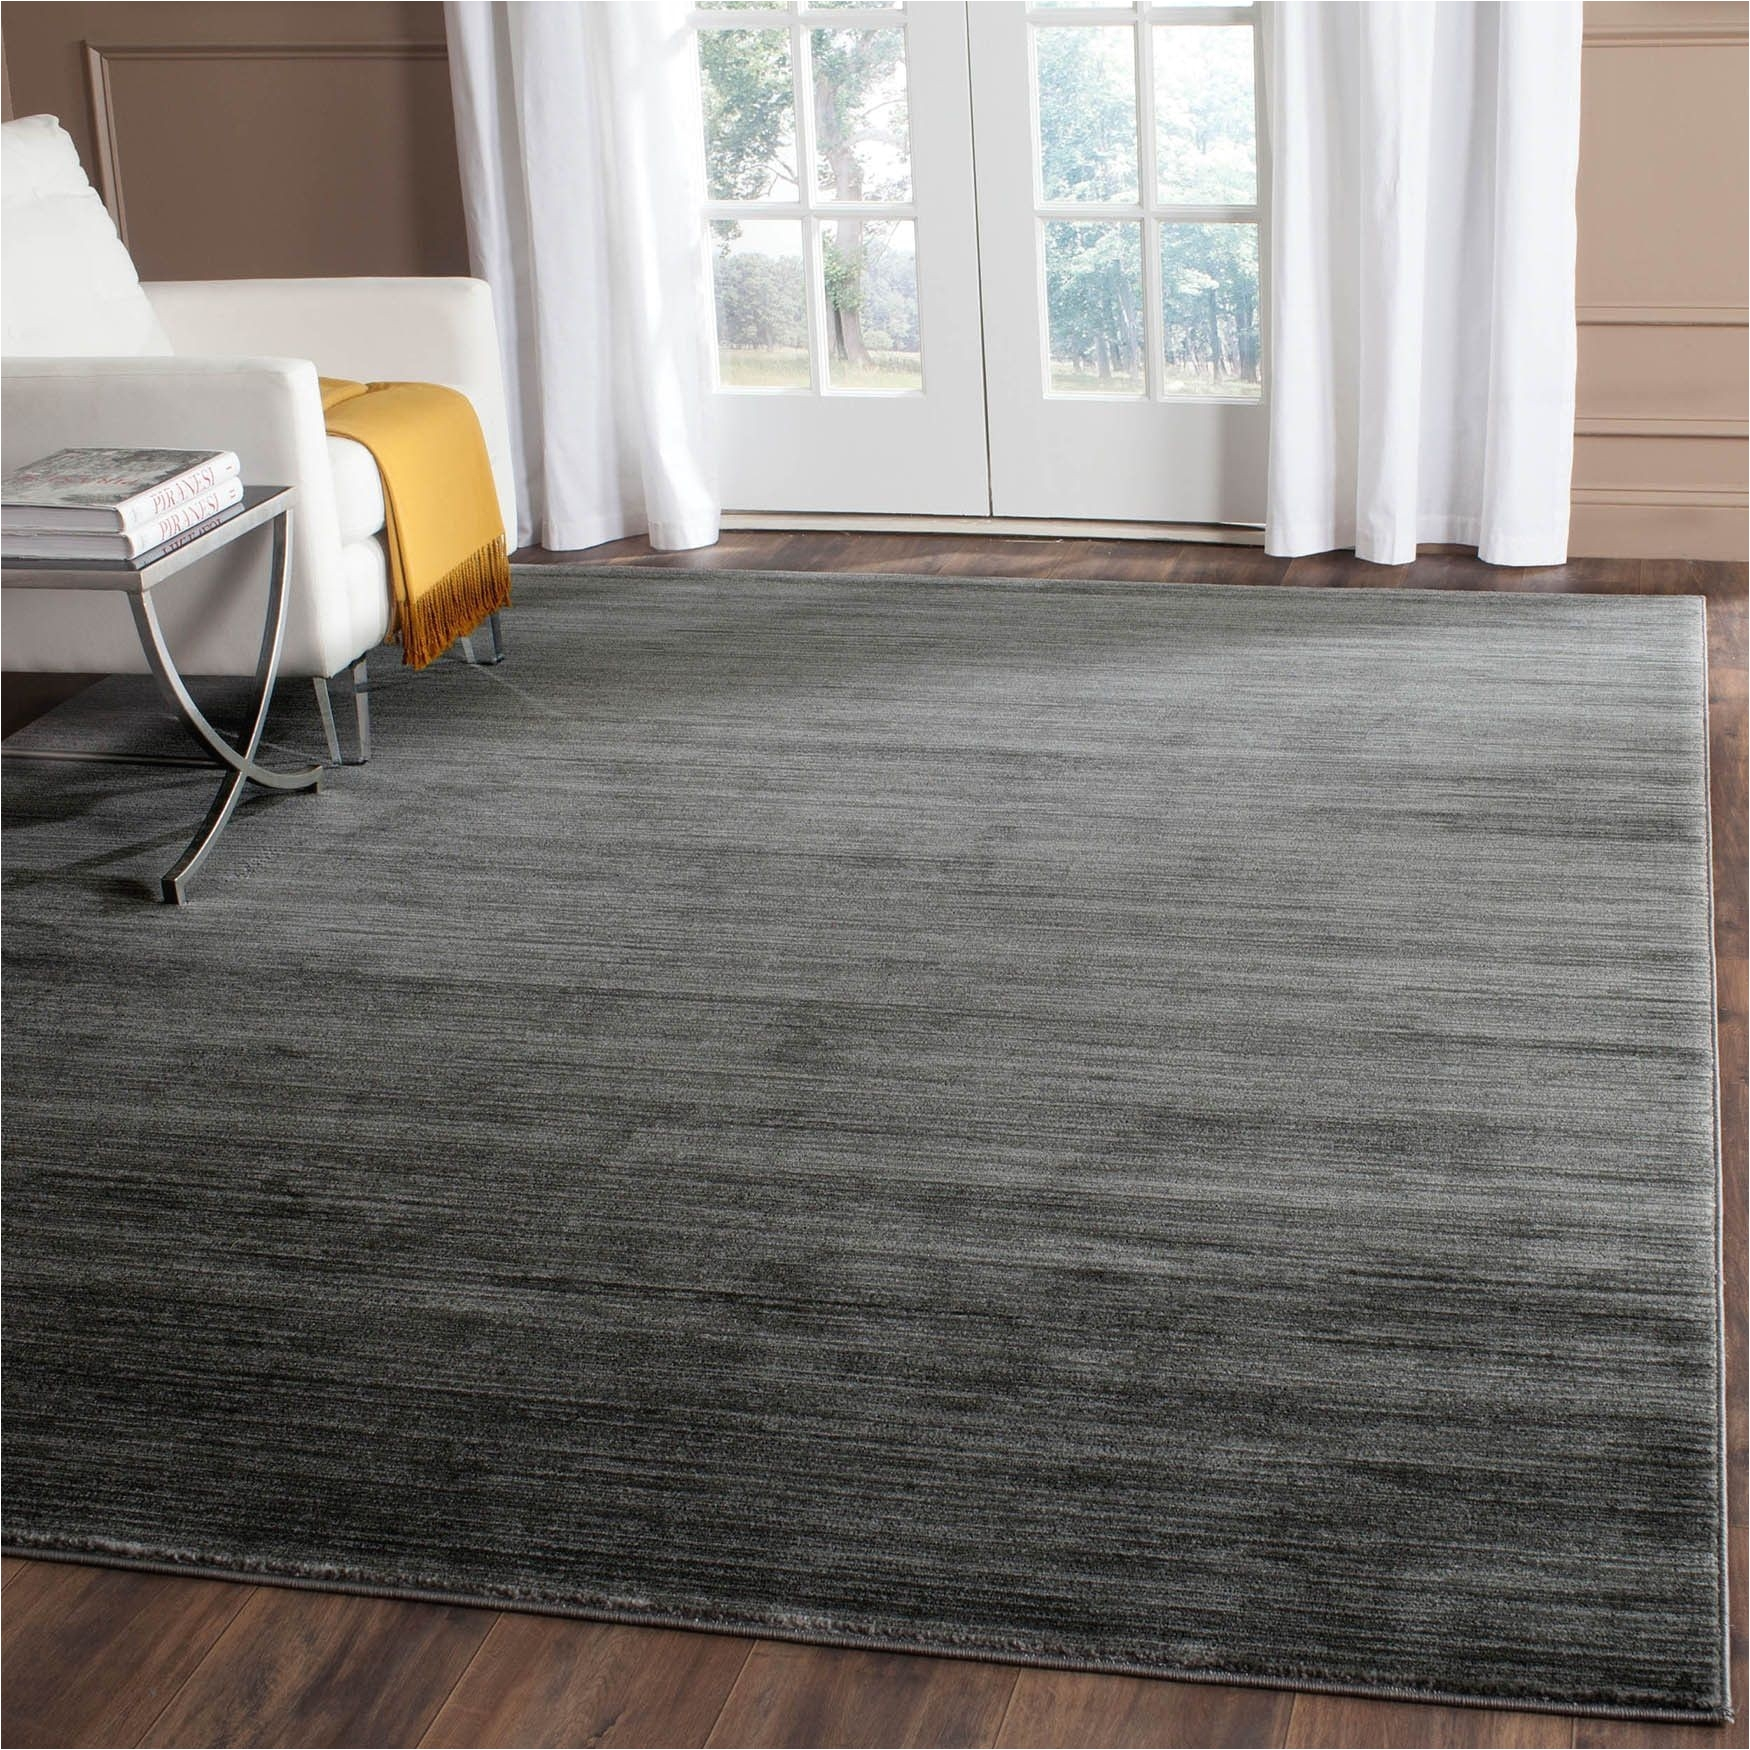 grey brown area rug best of safavieh vision contemporary tonal grey area rug 5 1 x